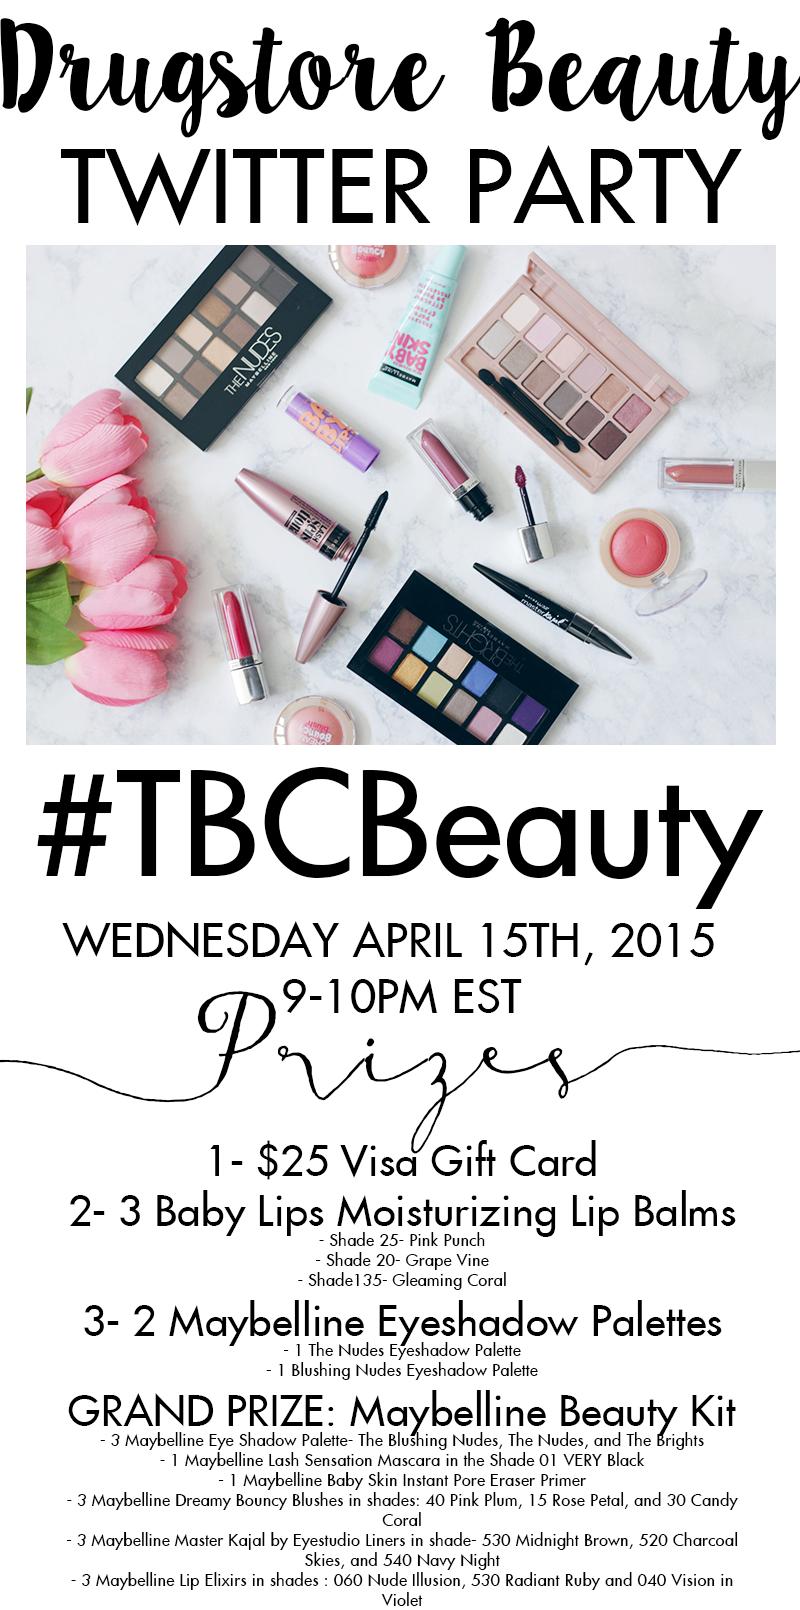 #tbcbeauty-Twitter-Party